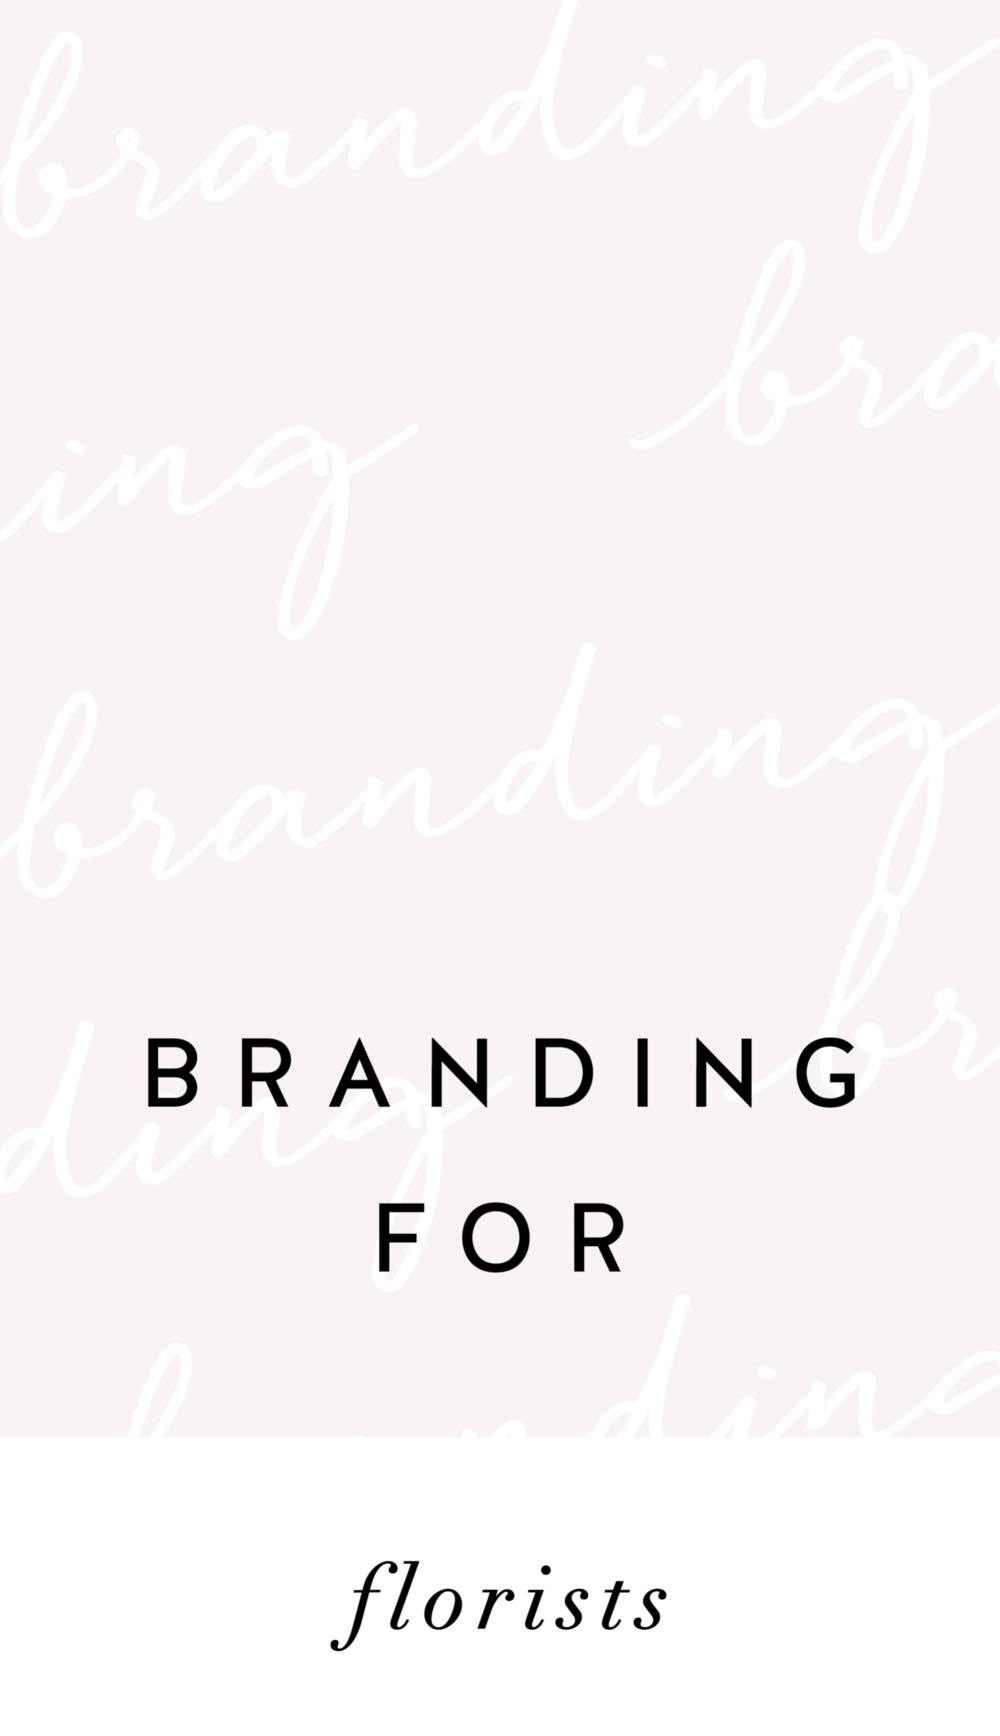 Branding-web-design-tips-june-mango-blog-posts-yoga-logo-21.png